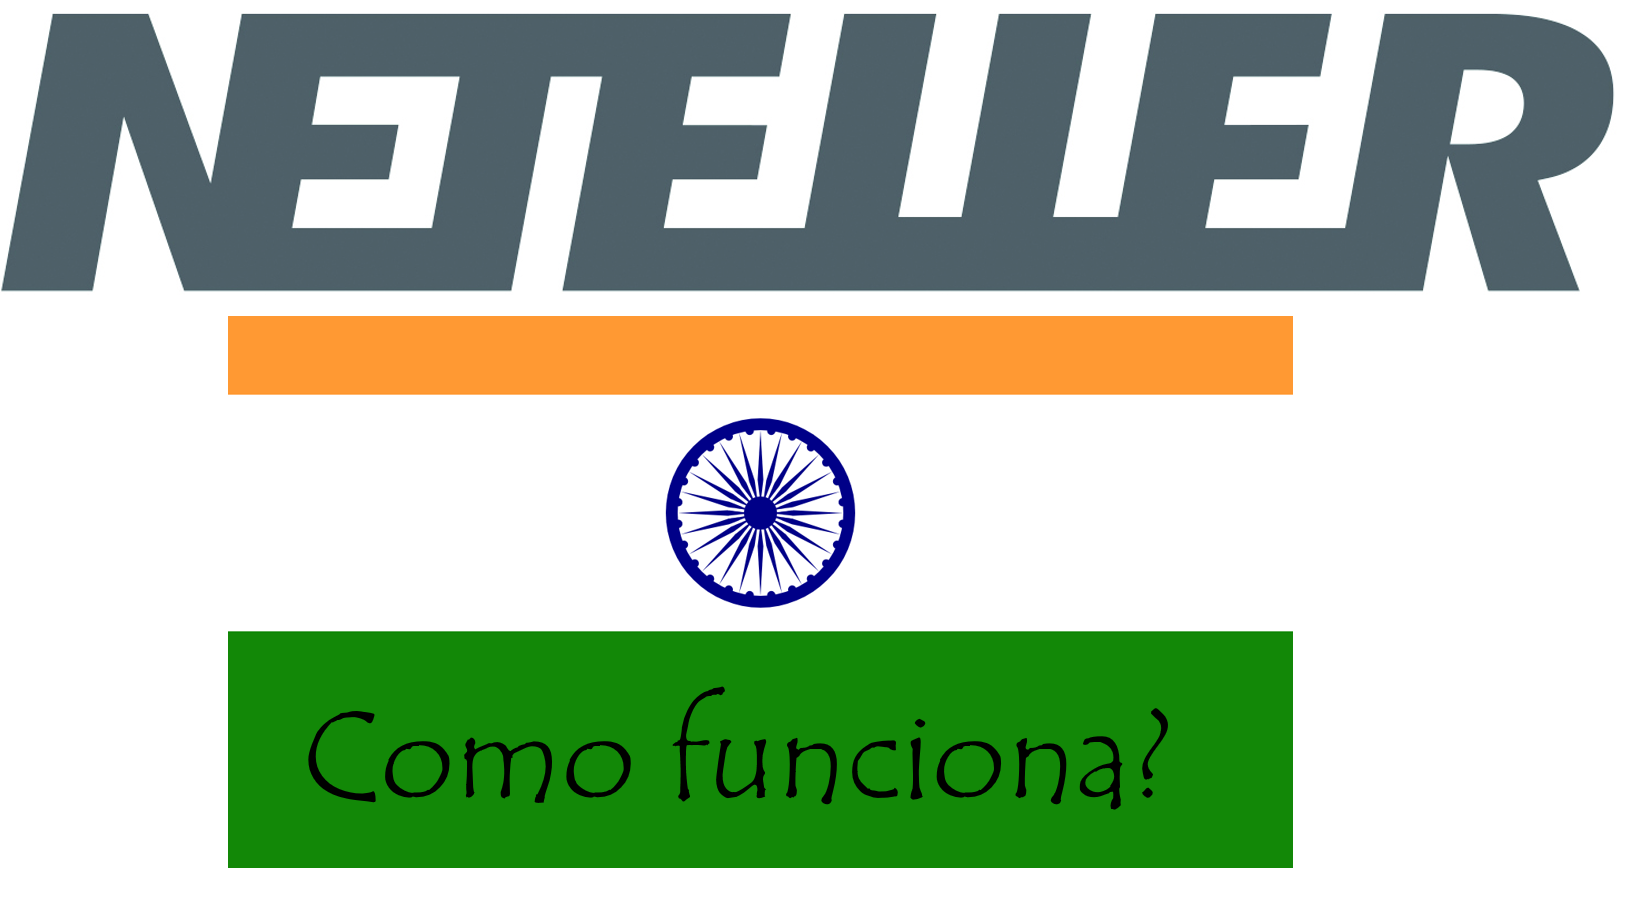 neteller usado na índia